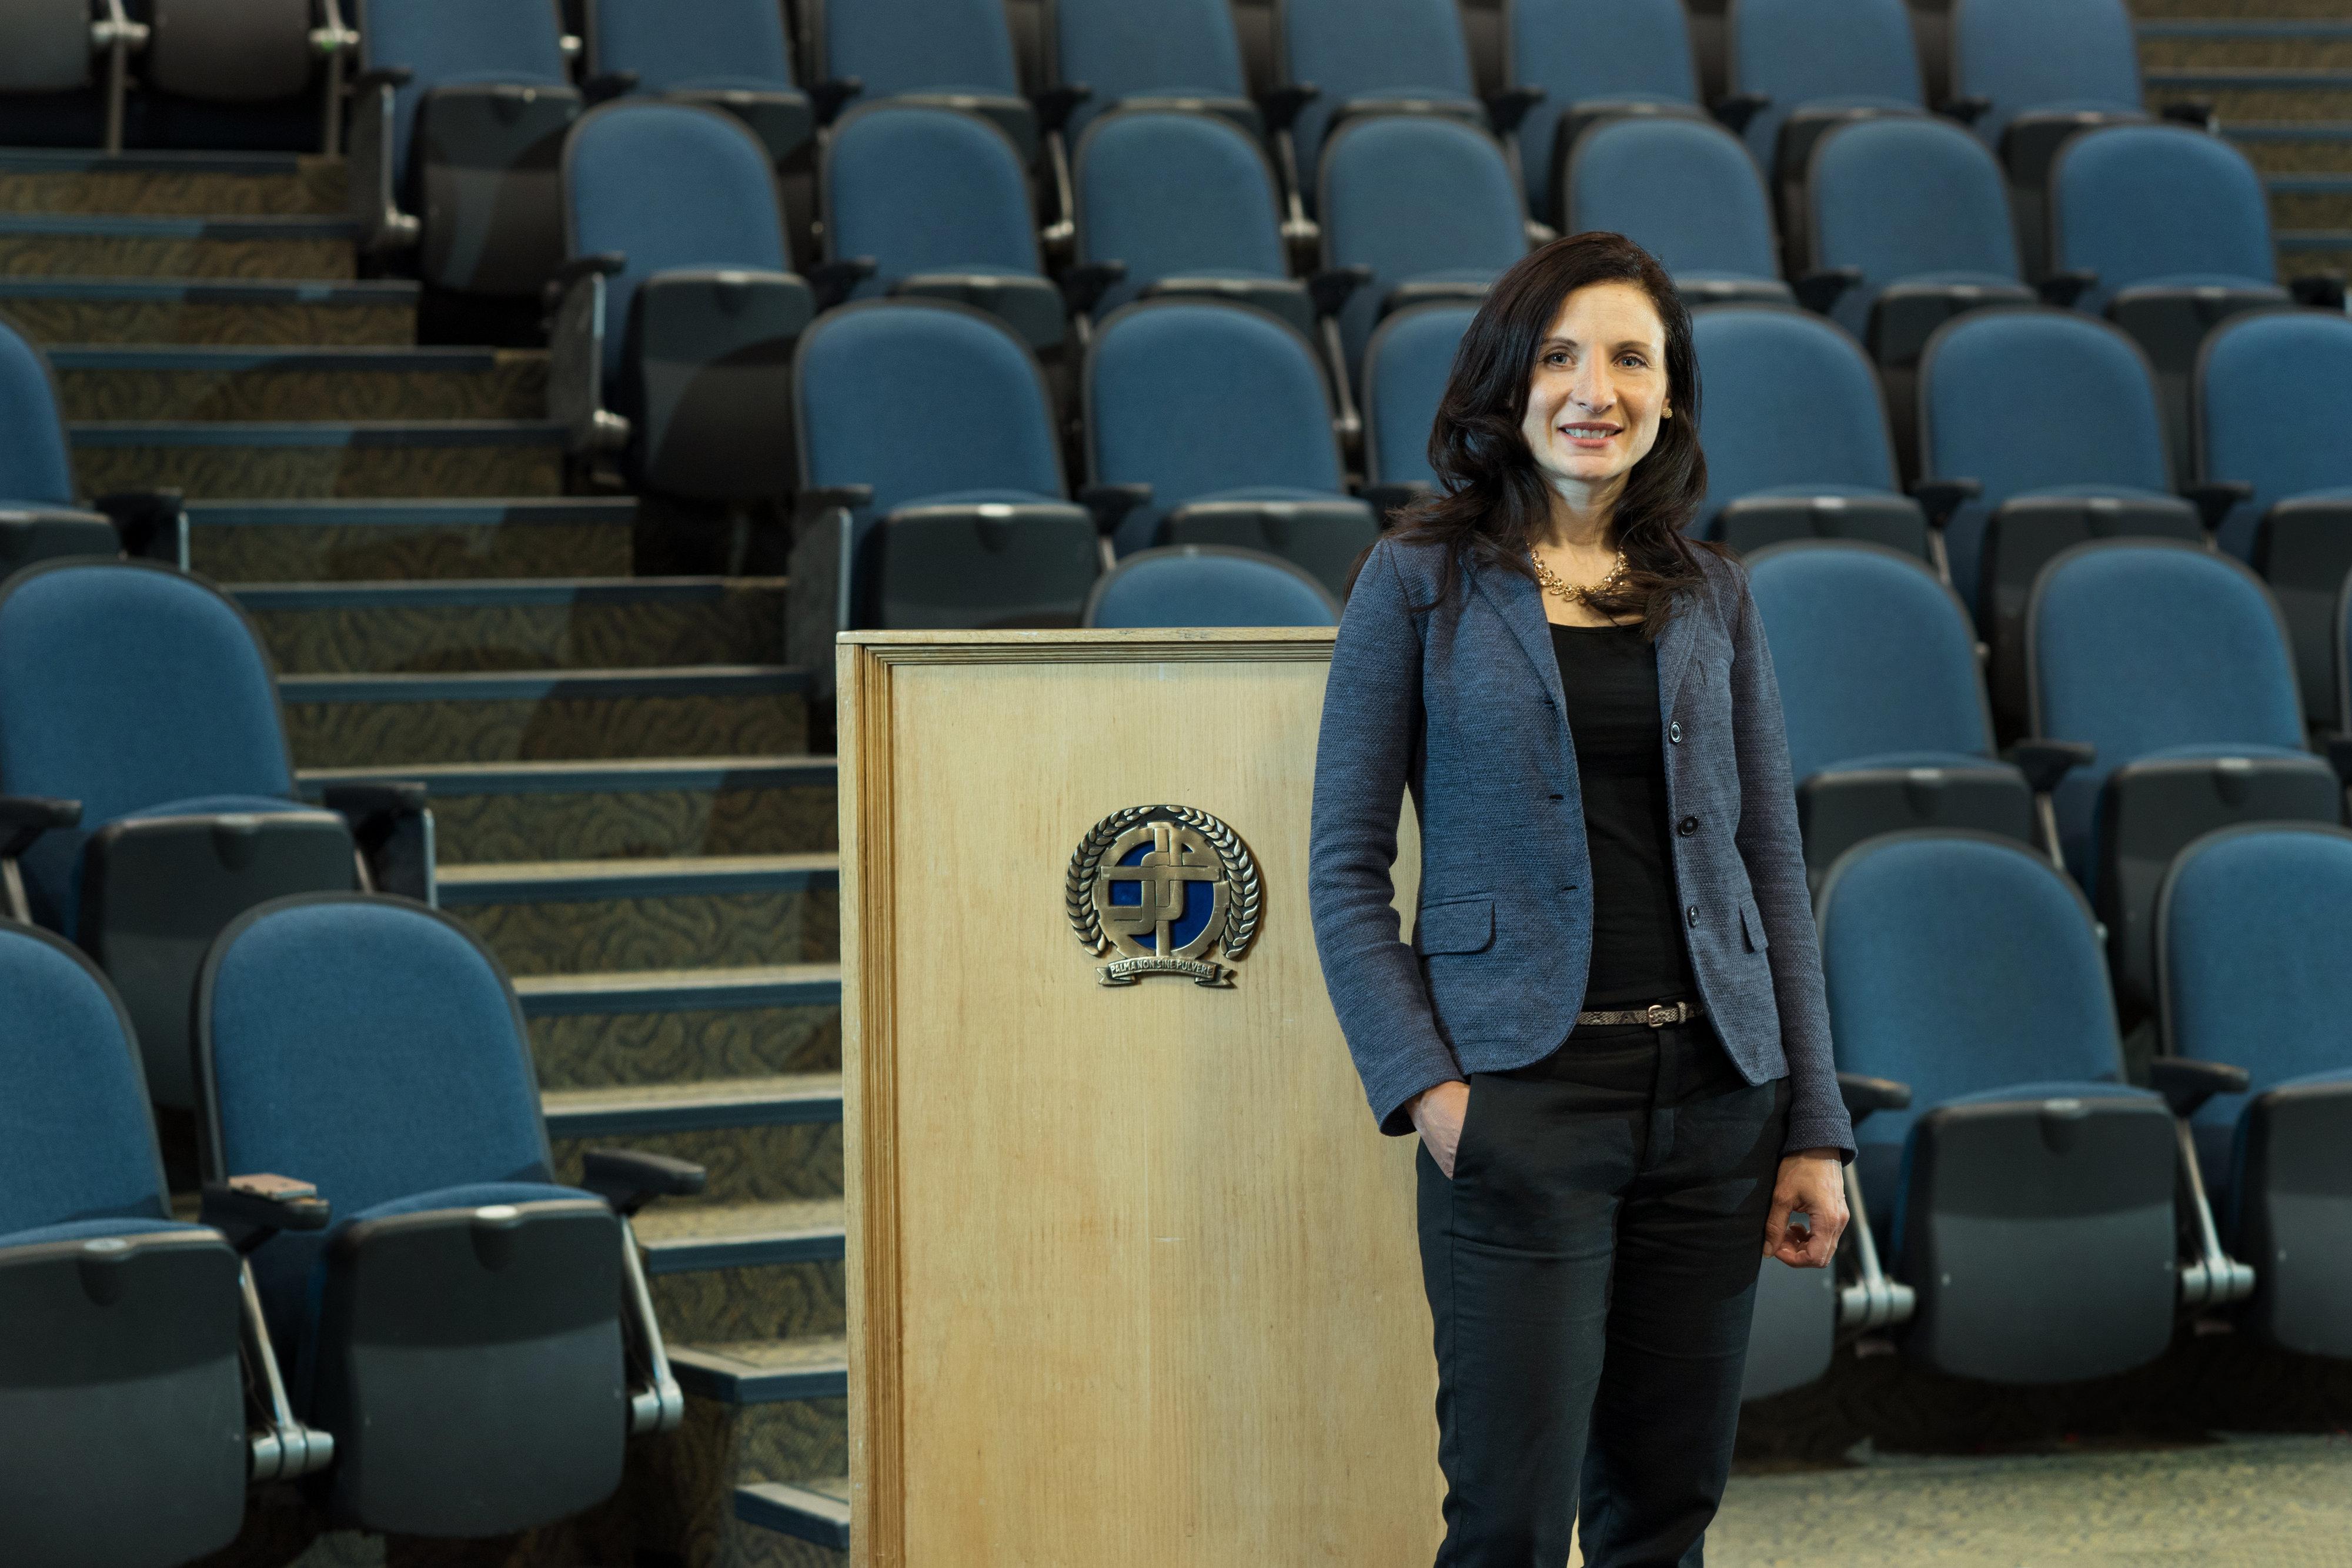 Carla Cuglietta's classroom is the world